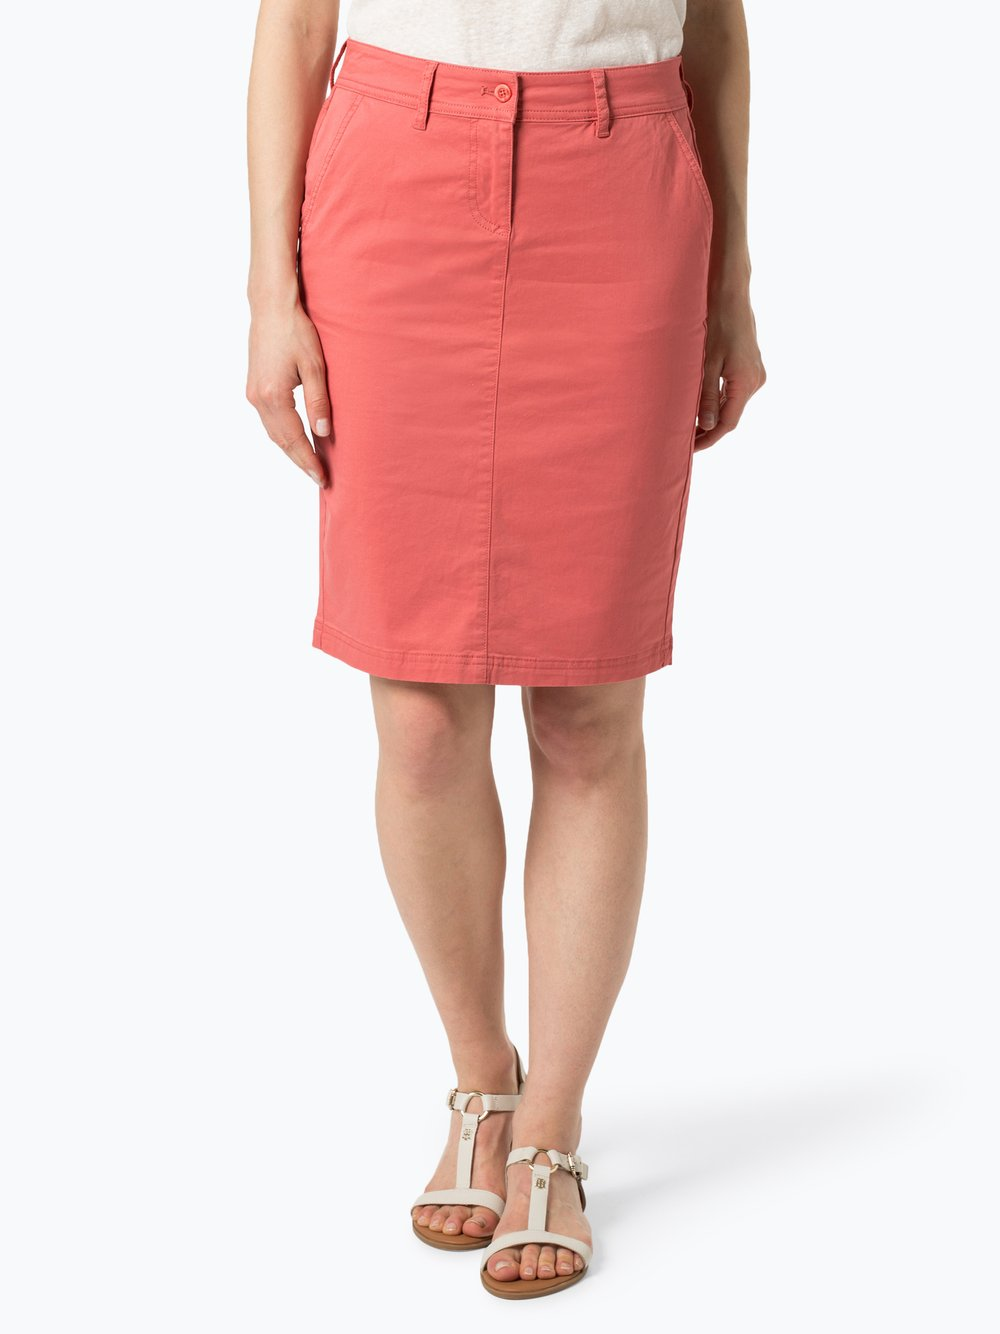 Franco Callegari - Spódnica damska, pomarańczowy